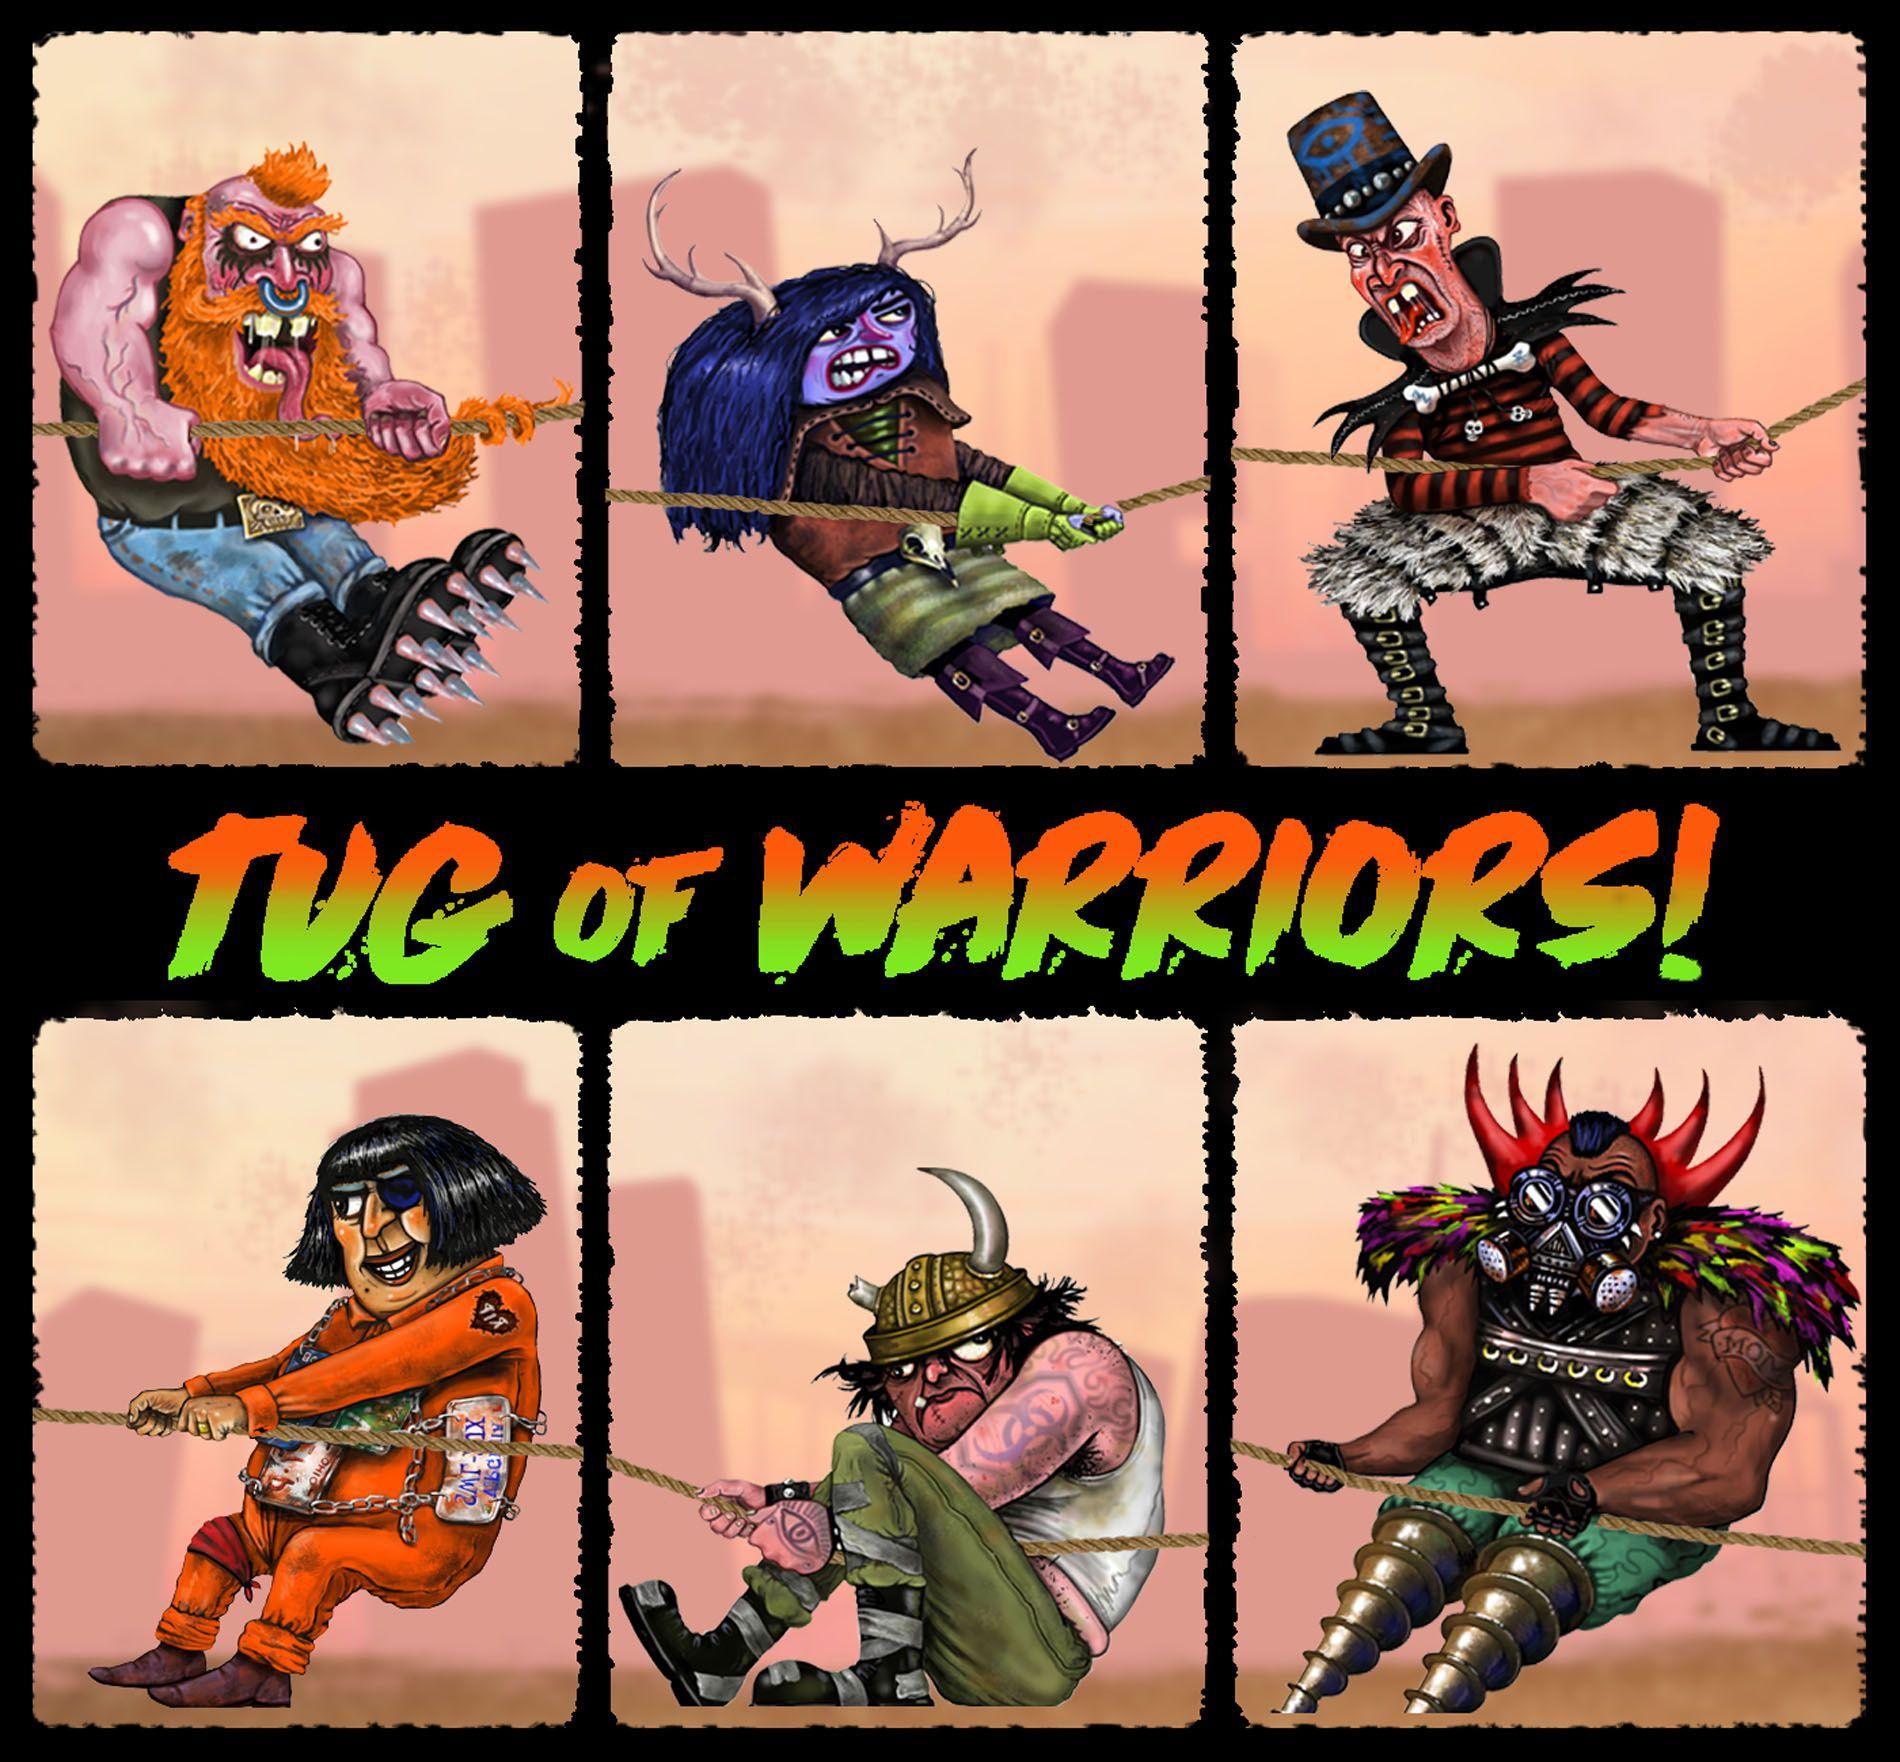 Tug-of-Warriors!